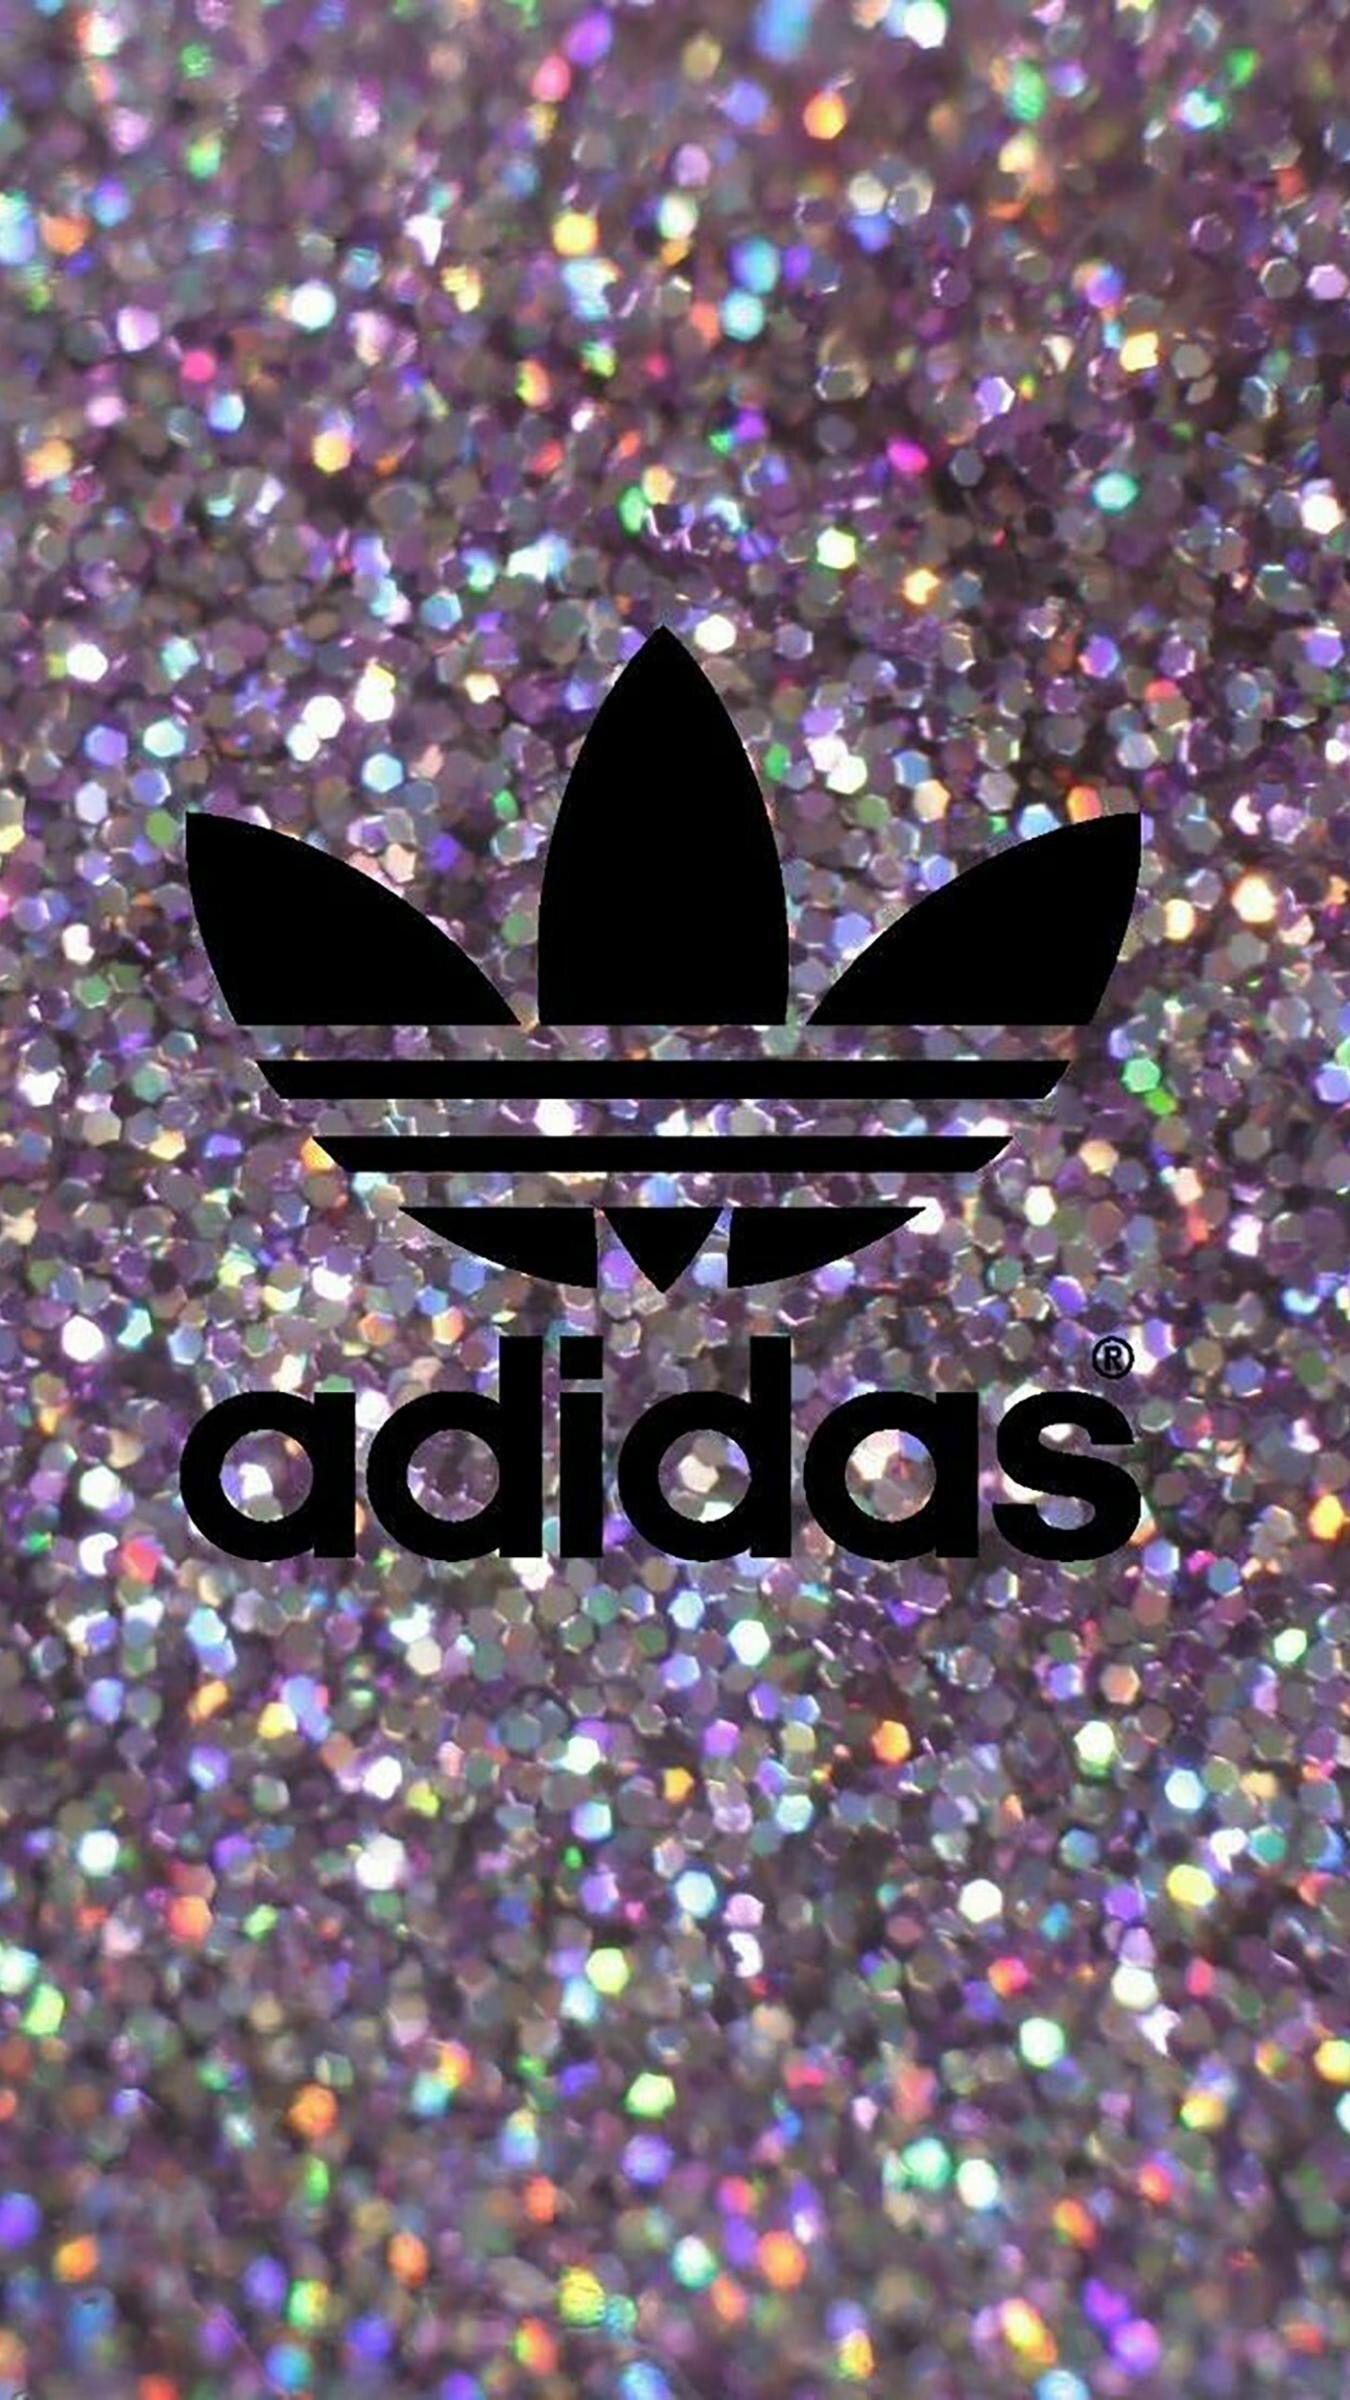 Fond d'écran adidas pailletes in 2019 | Adidas backgrounds, Adidas iphone wallpaper, Nike ...